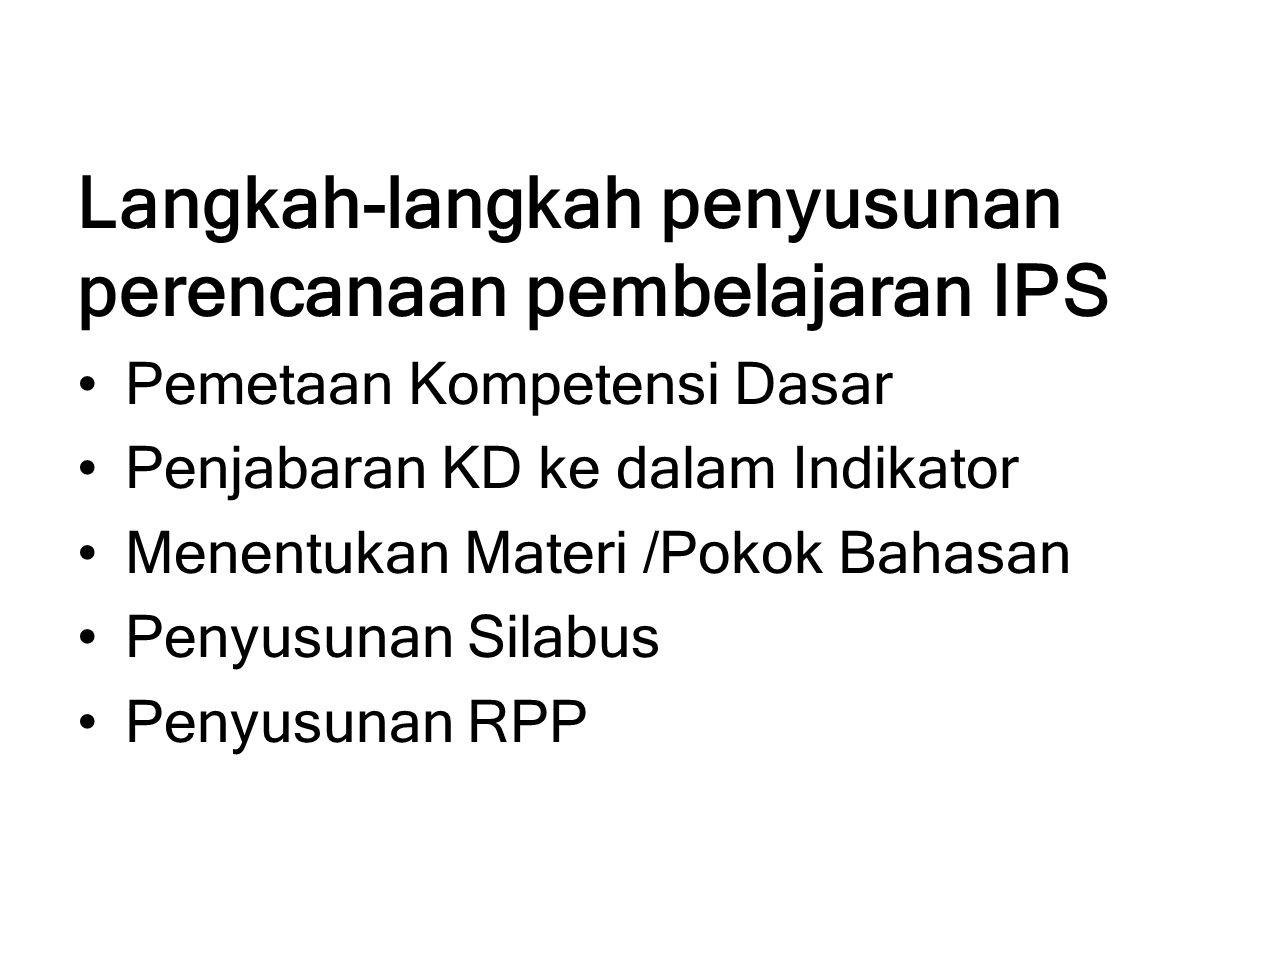 Langkah-langkah penyusunan perencanaan pembelajaran IPS